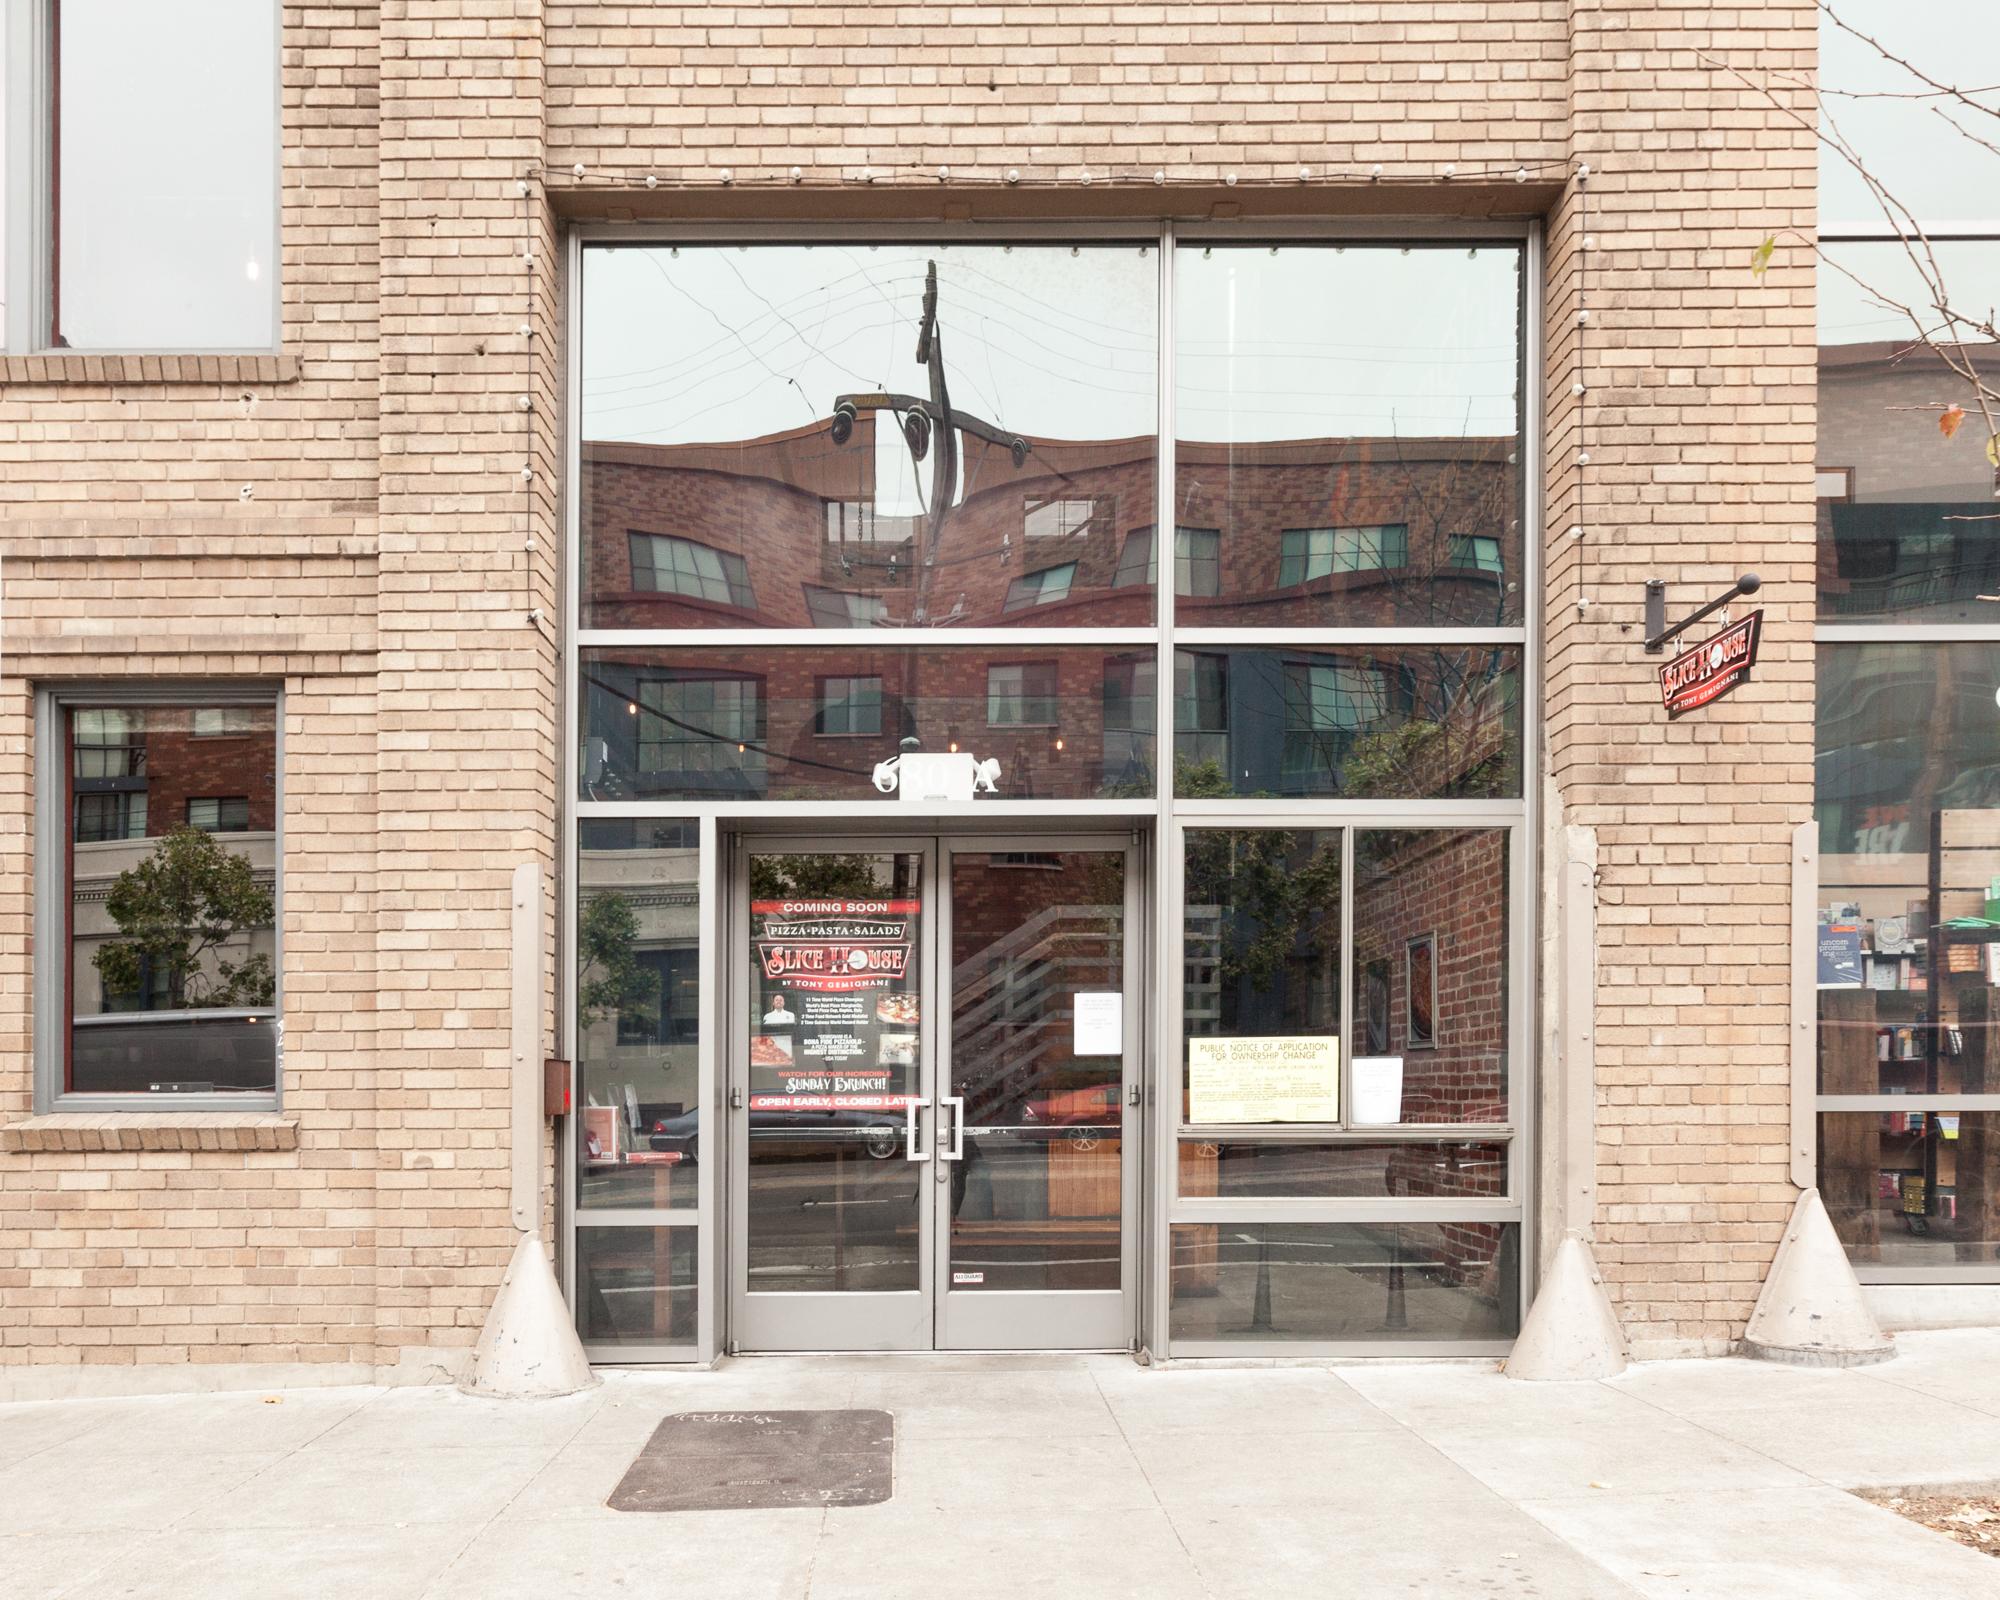 Tony Gemignani Extends Pizza Domination to Walnut Creek